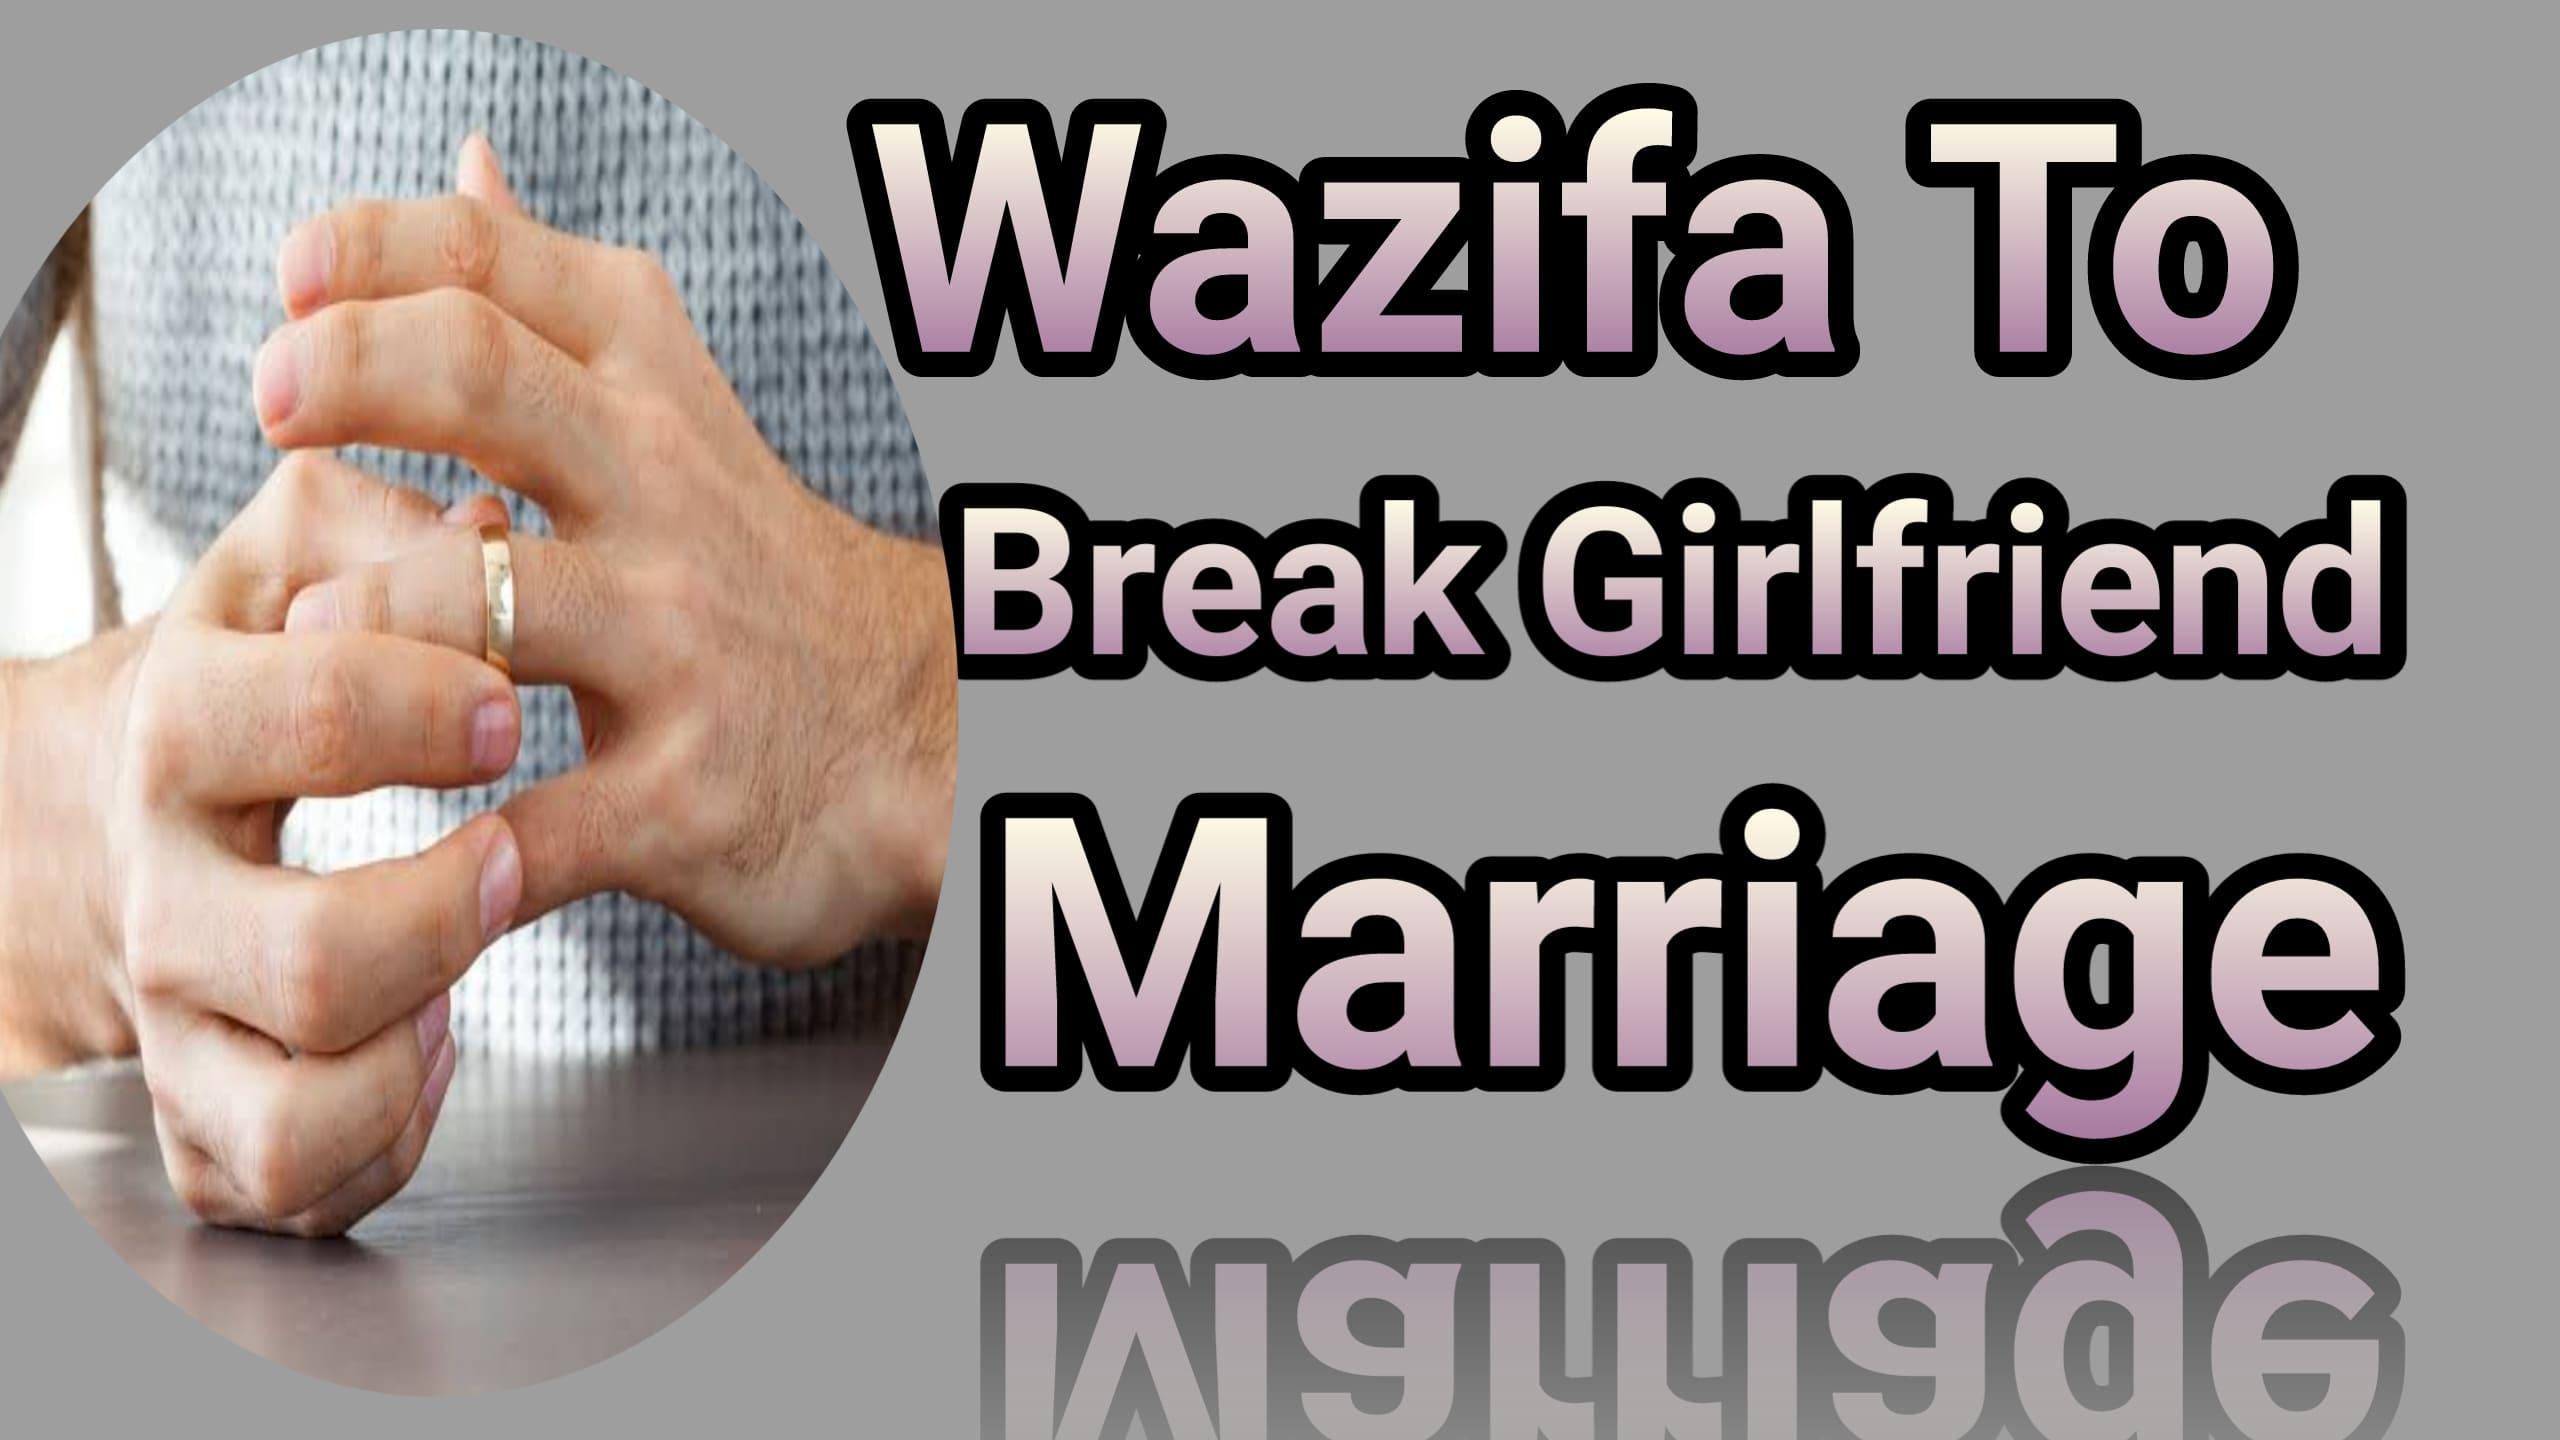 Wazifa to break girlfriend marriage